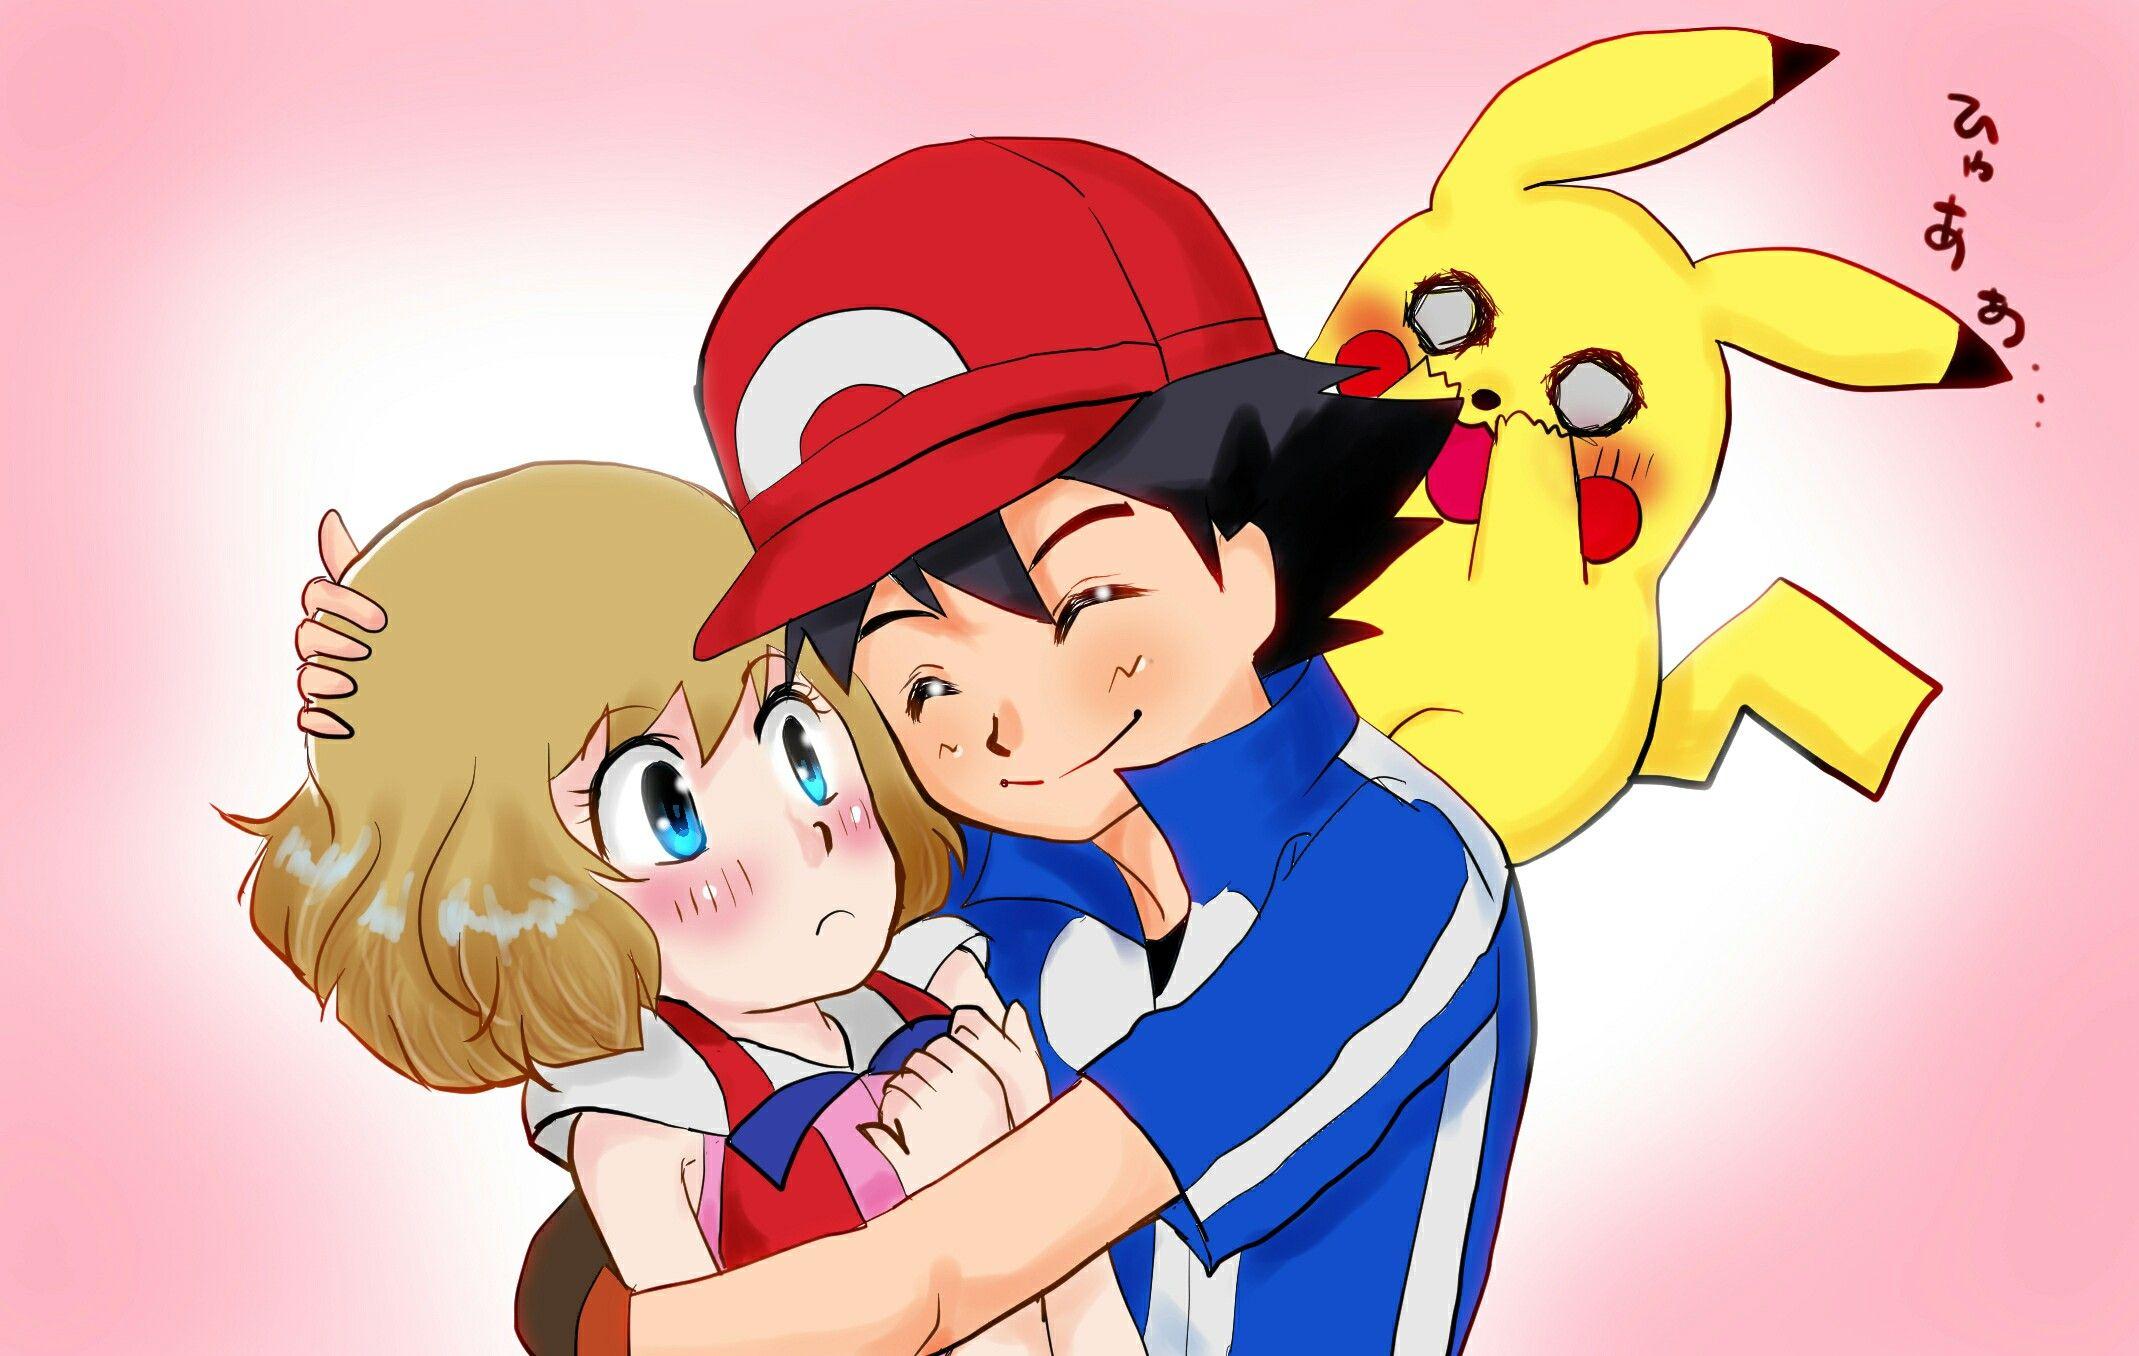 Pin By Dark Sr On Best Of Amour Pokemon Ash And Serena Pokemon Kalos Pokemon Charizard